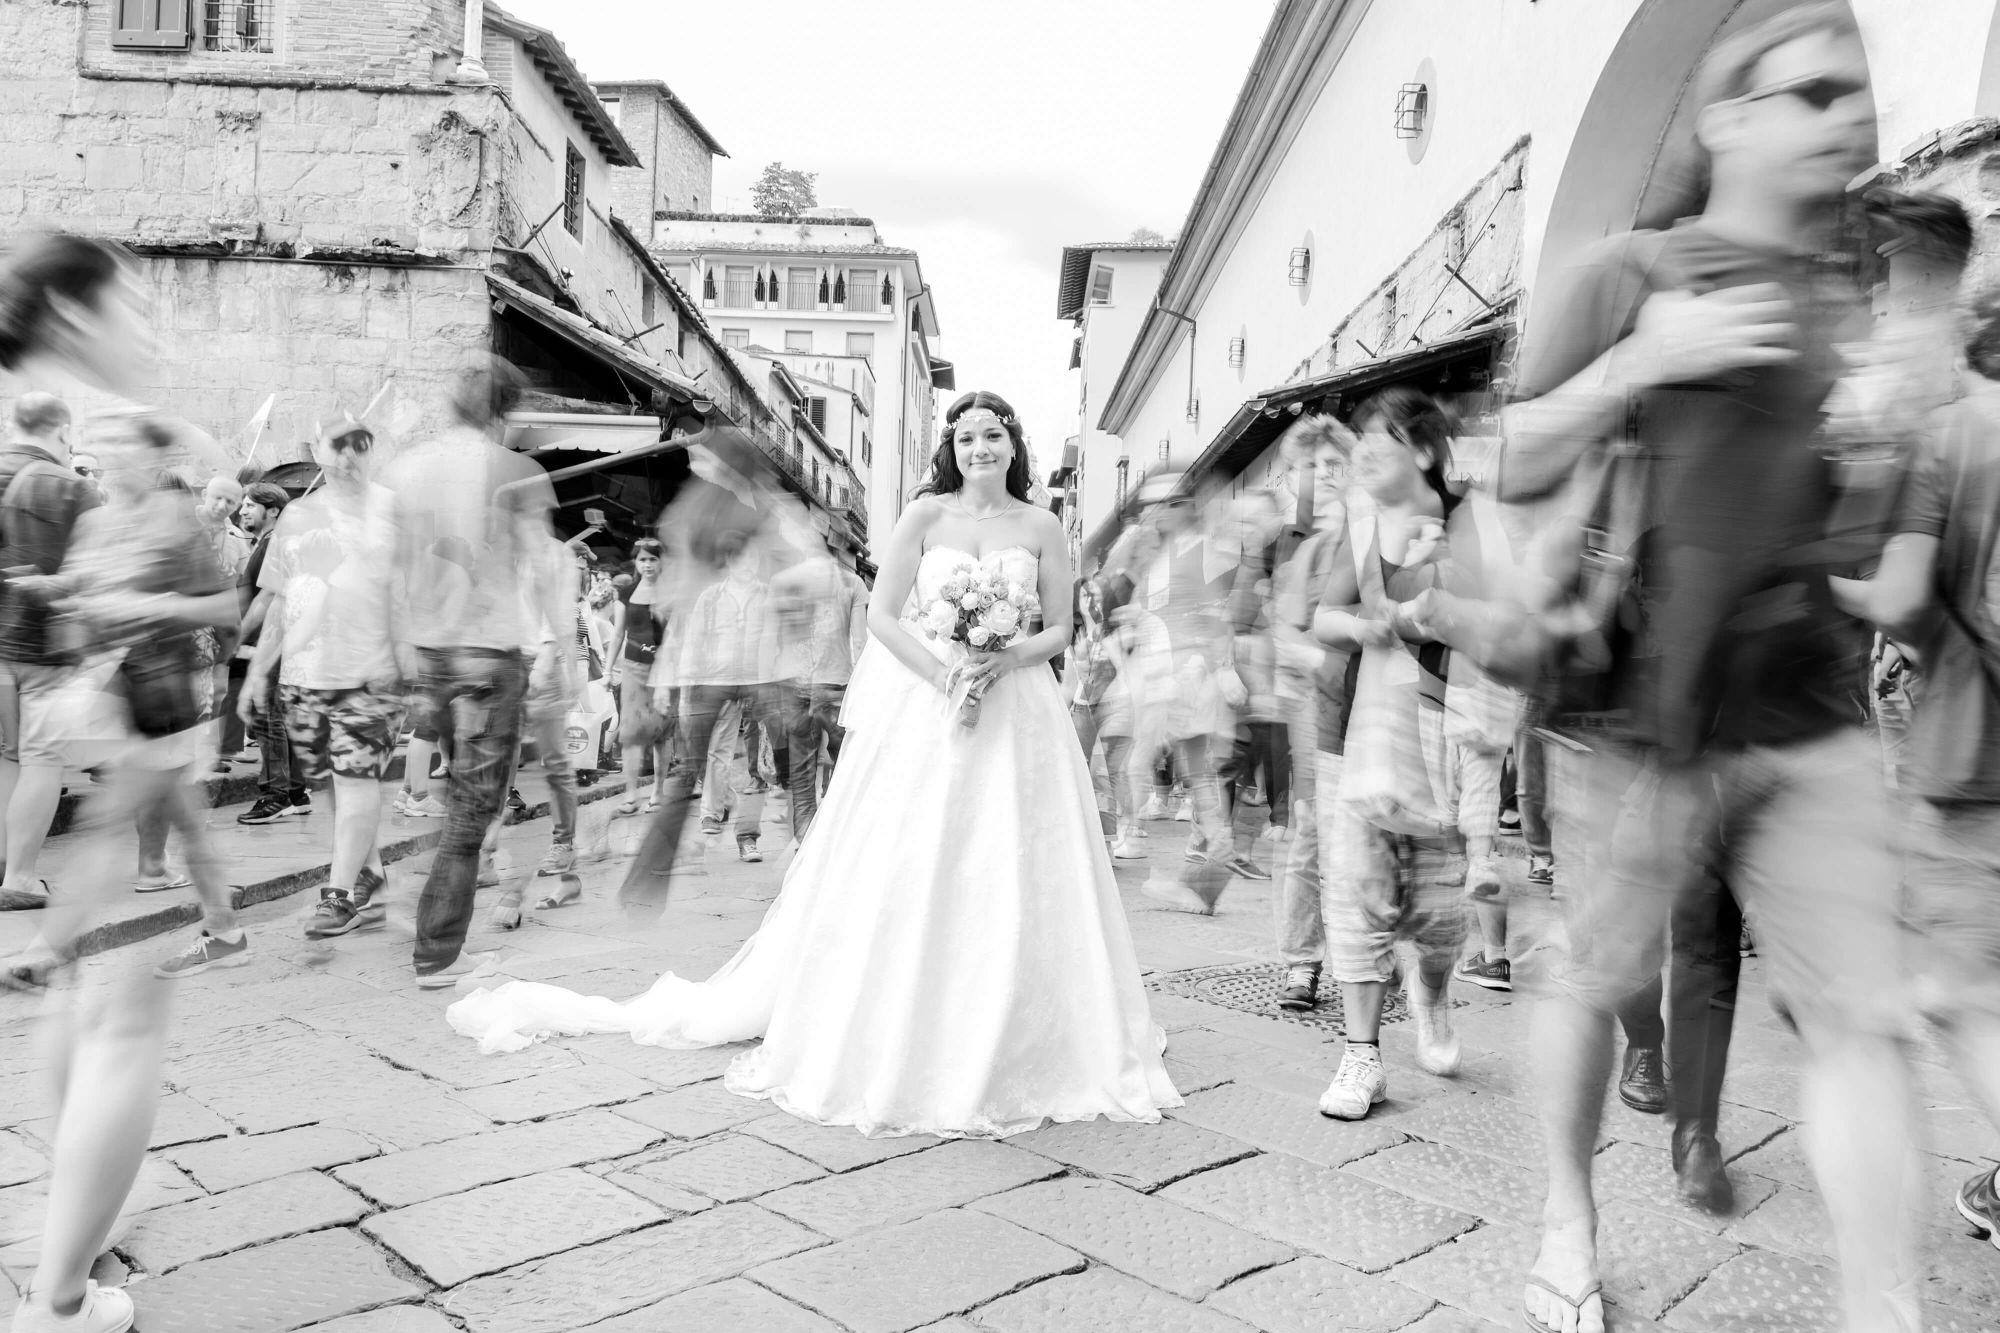 matrimonio G&B - Ponte Vecchio - Firenze